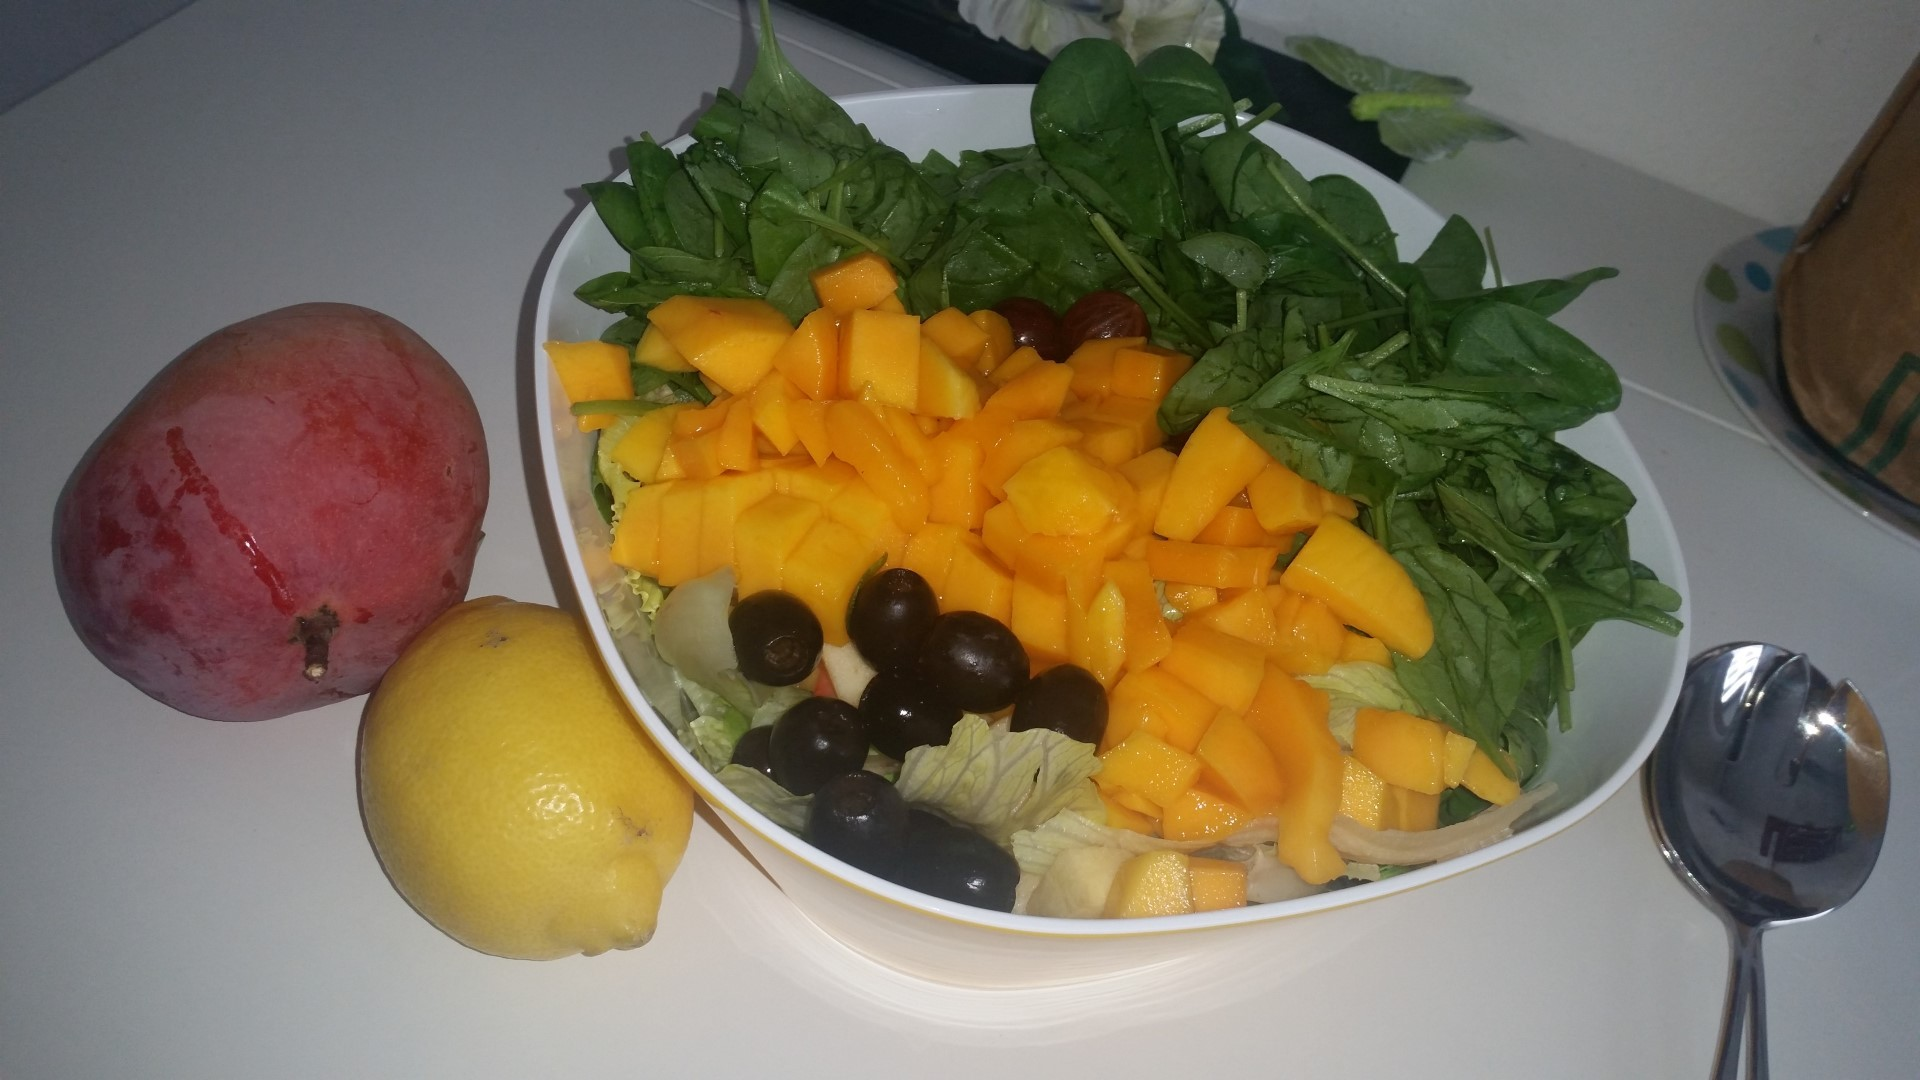 Fruity Summer Salad With Gooseberries